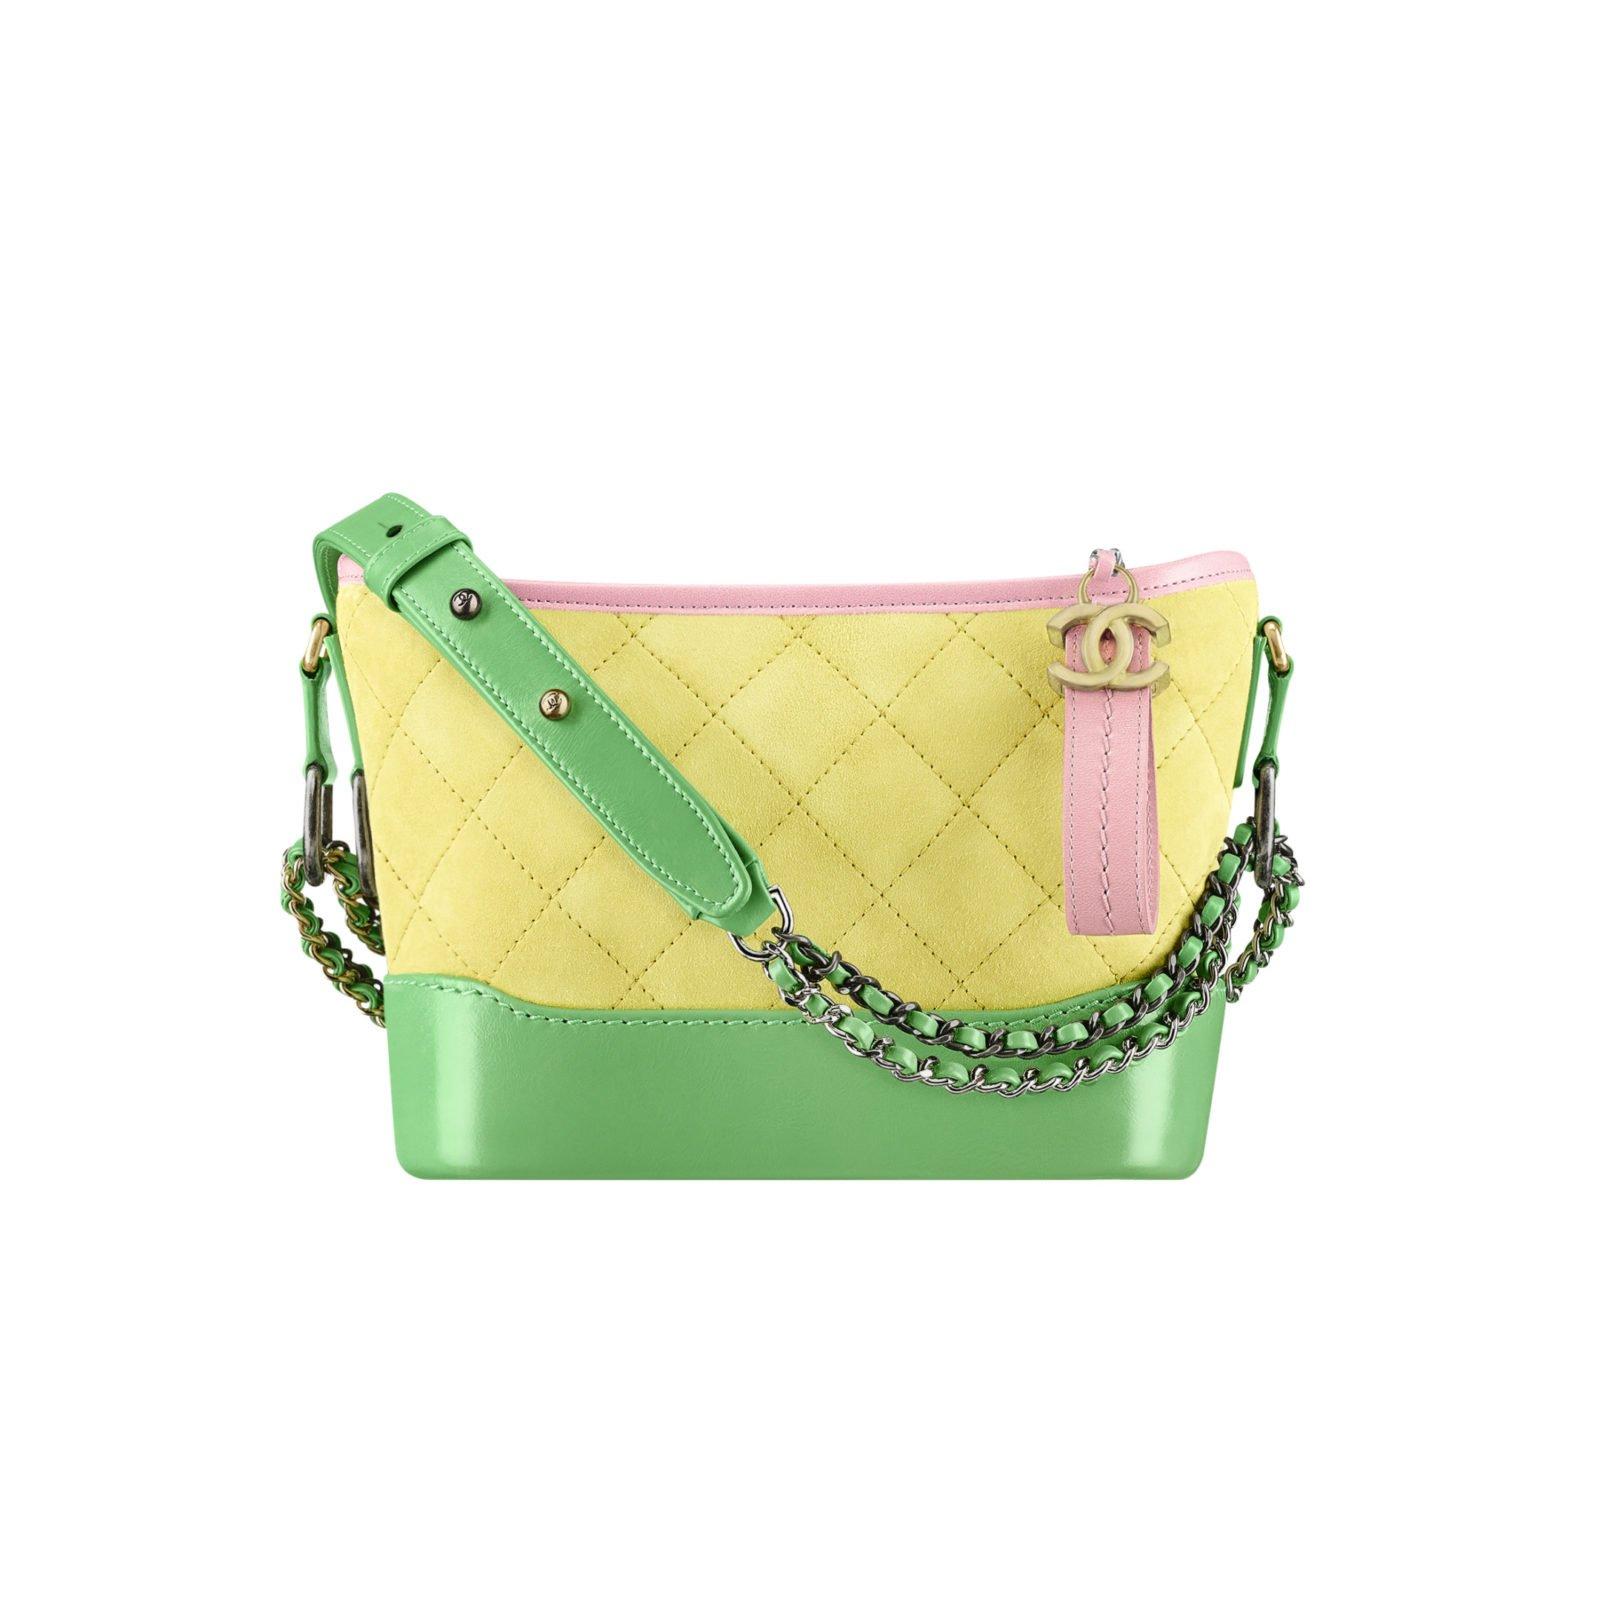 72f47879e2 New at Chanel: The Chanel Gabrielle Bag - PurseBop